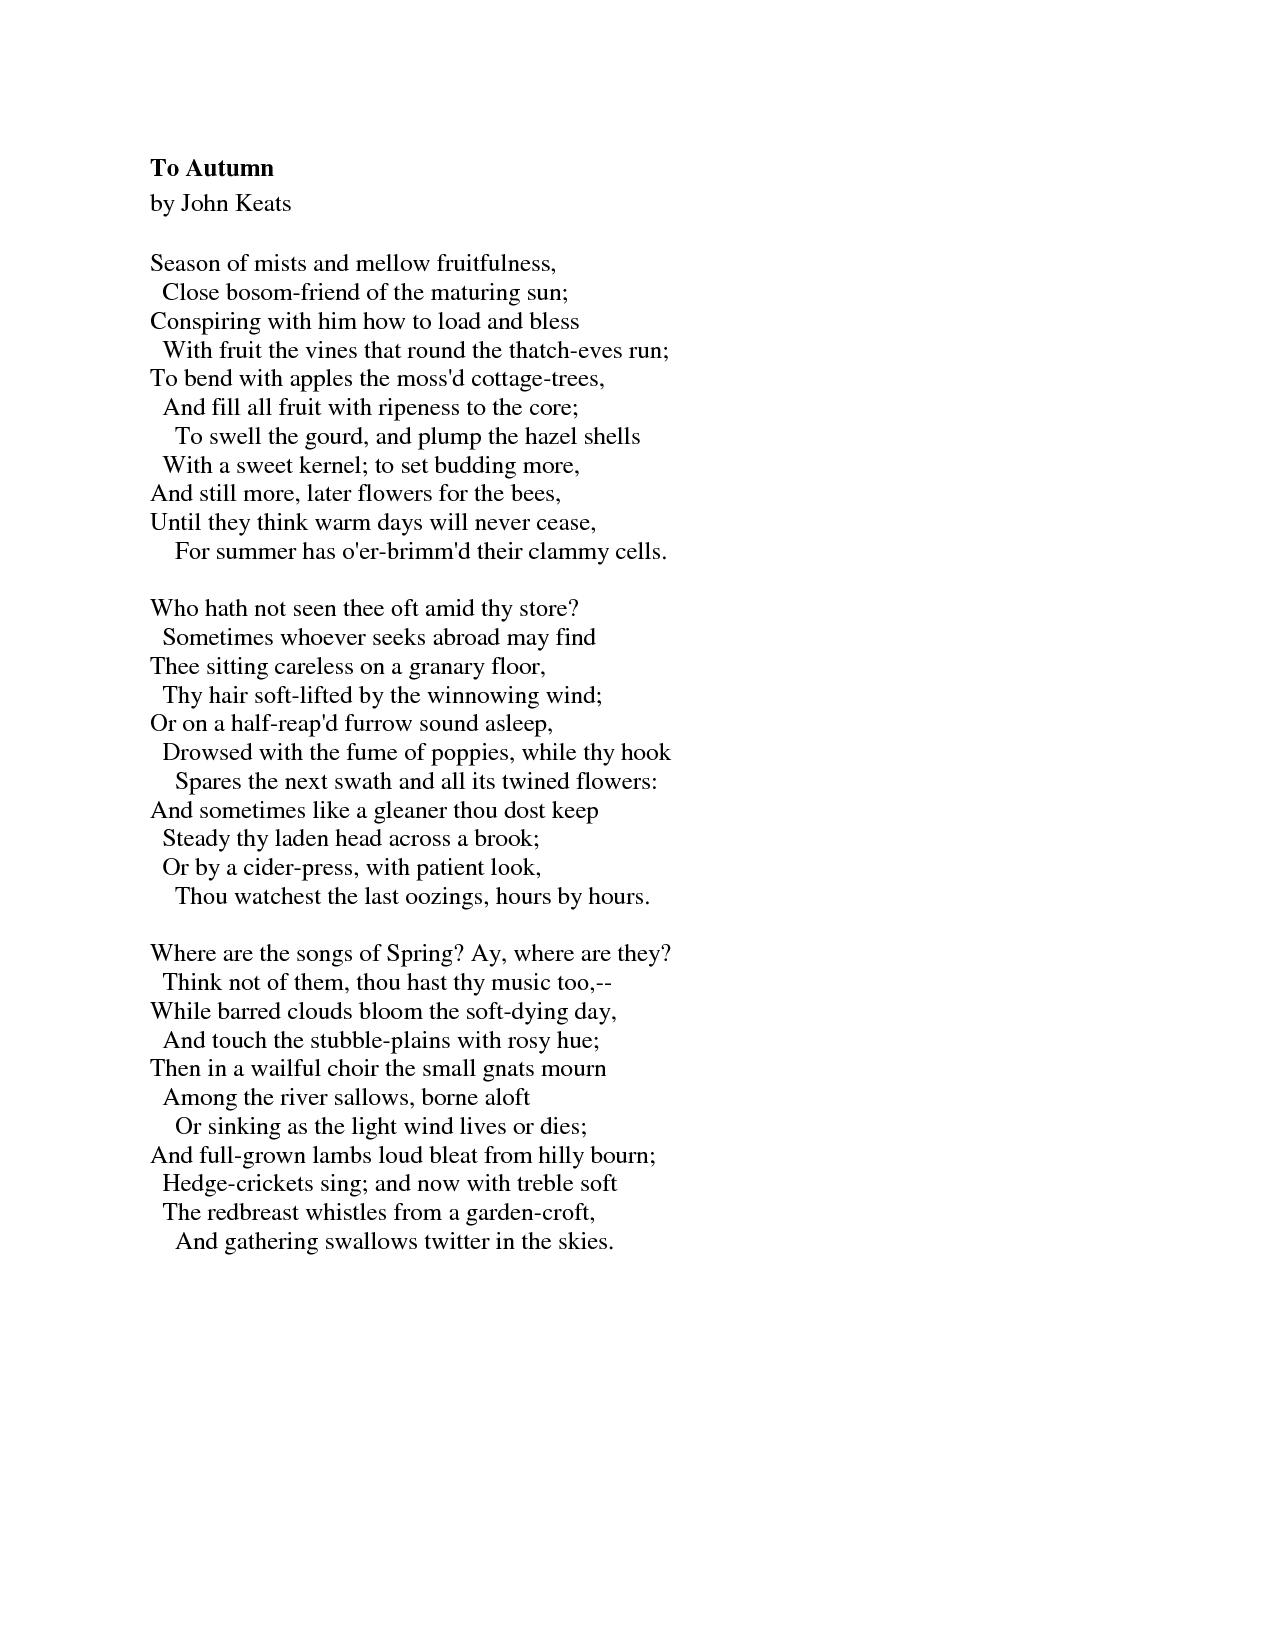 To Autumn : John Keats | Influential Poets/poems | Pinterest ...